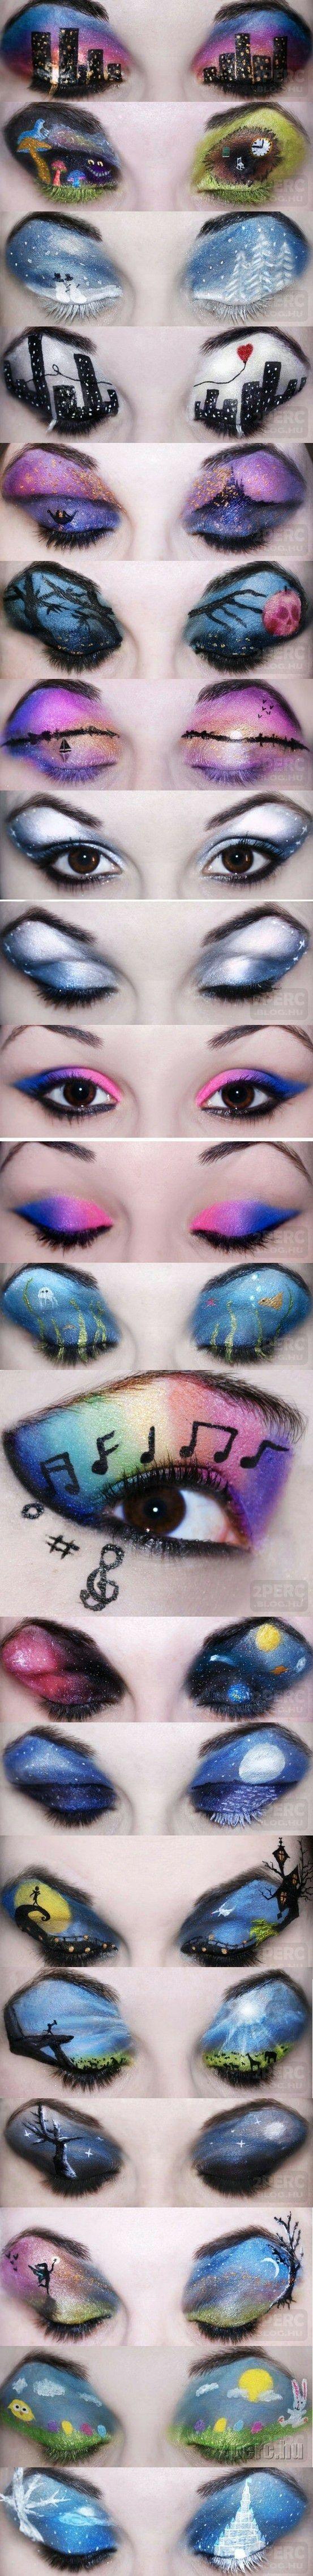 Cool Eye Makeups.